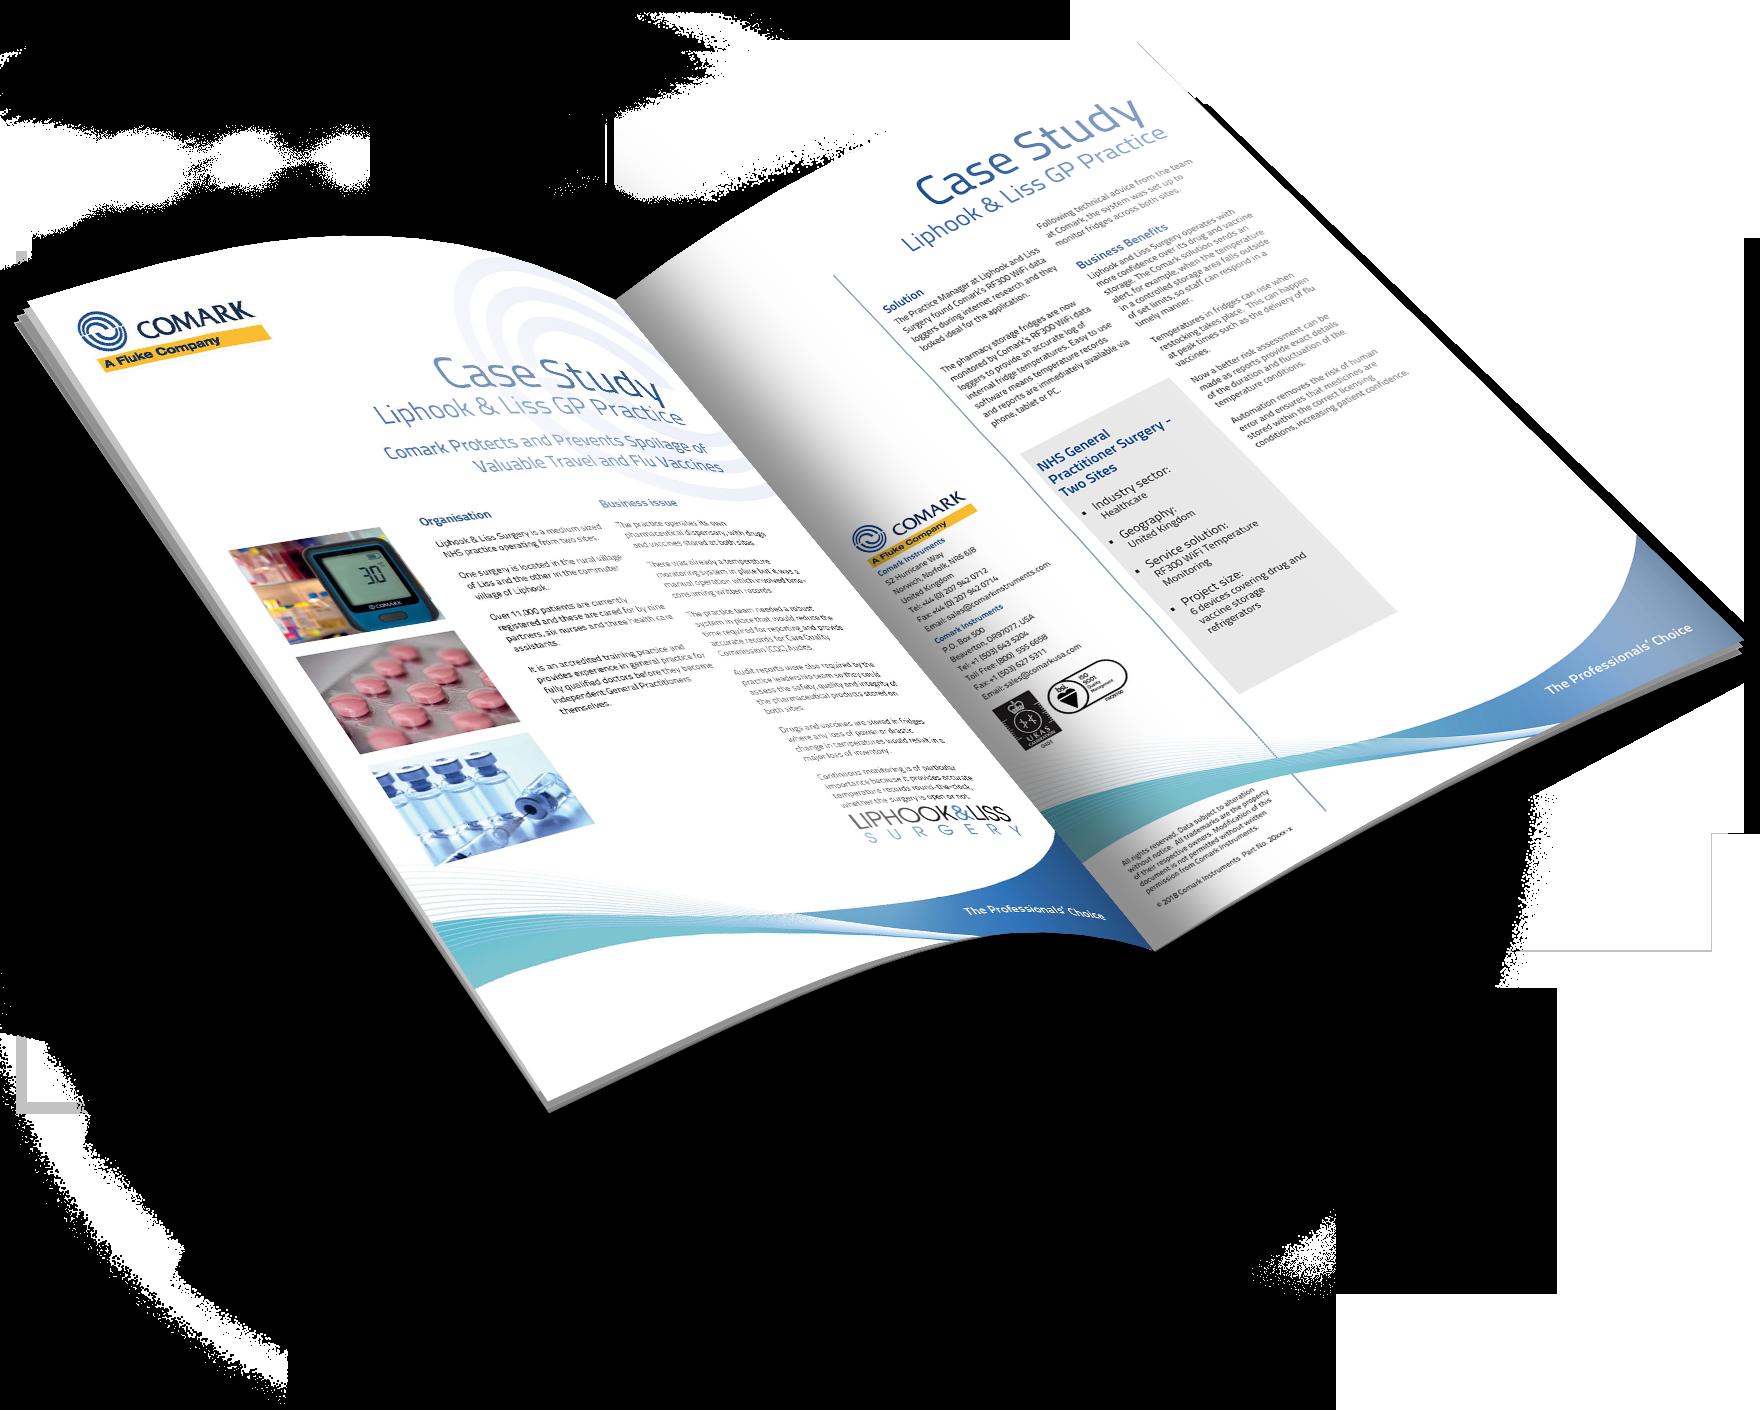 Liphook & Liss GP Practice Case Study